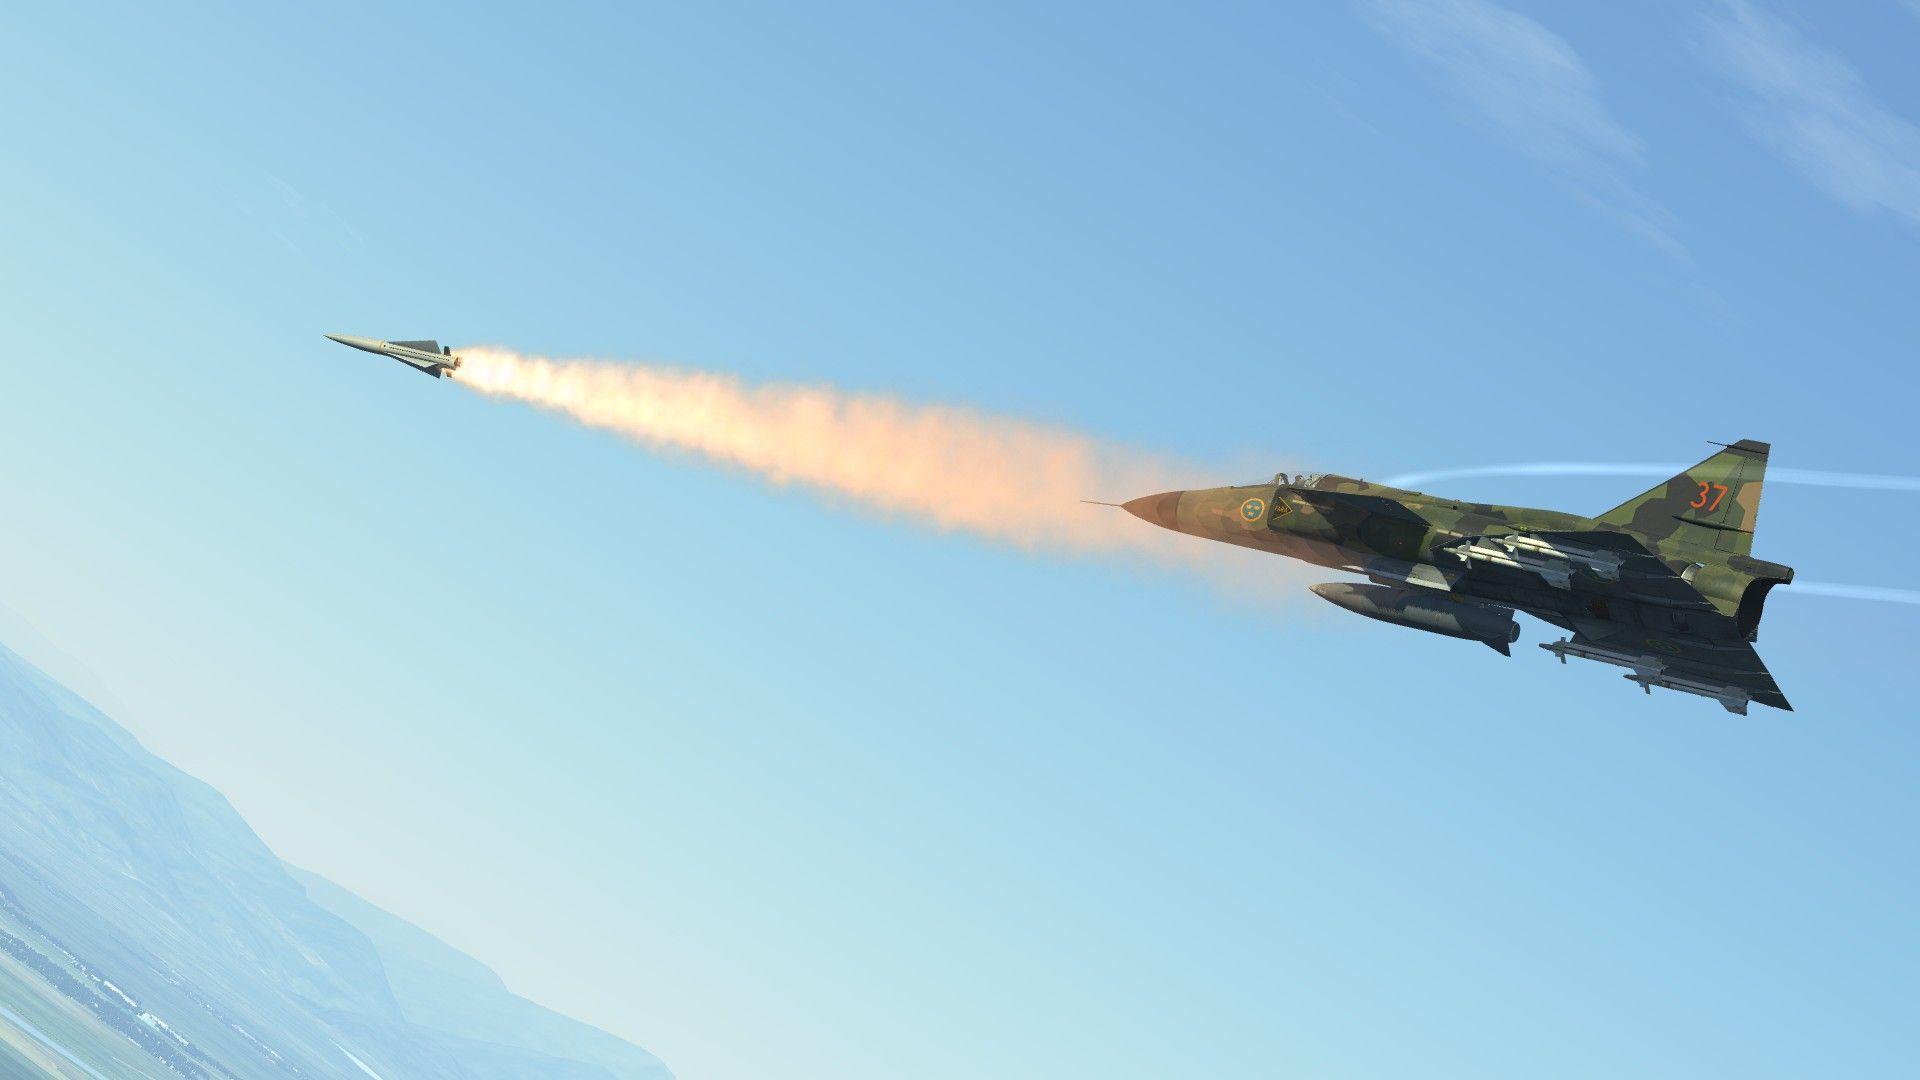 DCS: AJS-37 Viggen | arma 3 | Fighter jets, Guns, Aircraft